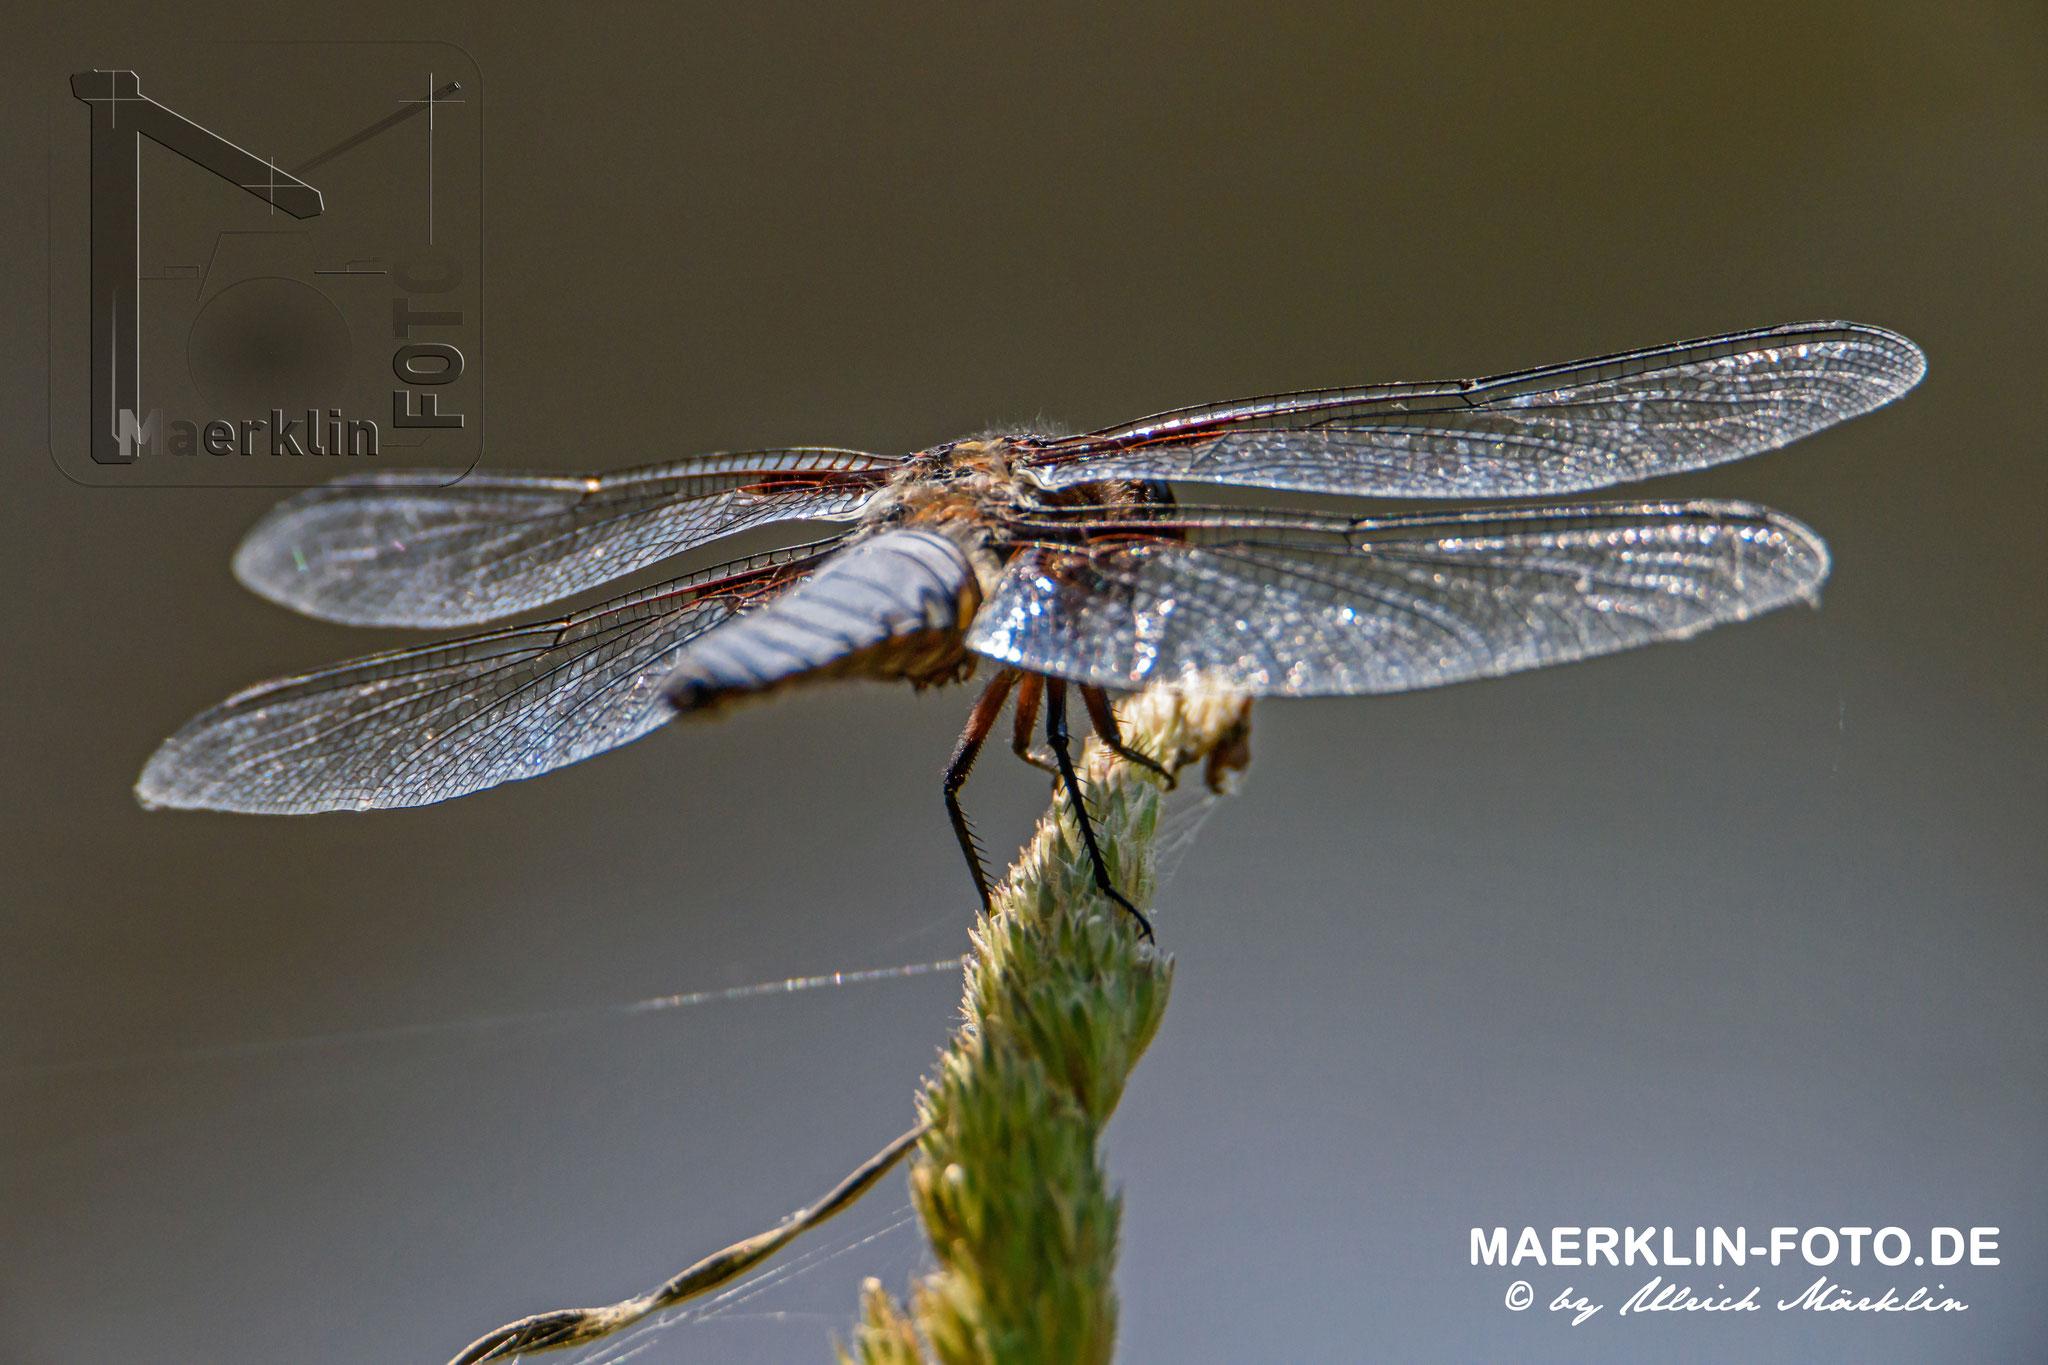 Großer Blaupfeil, Orthetrum cancellatum, Libelle